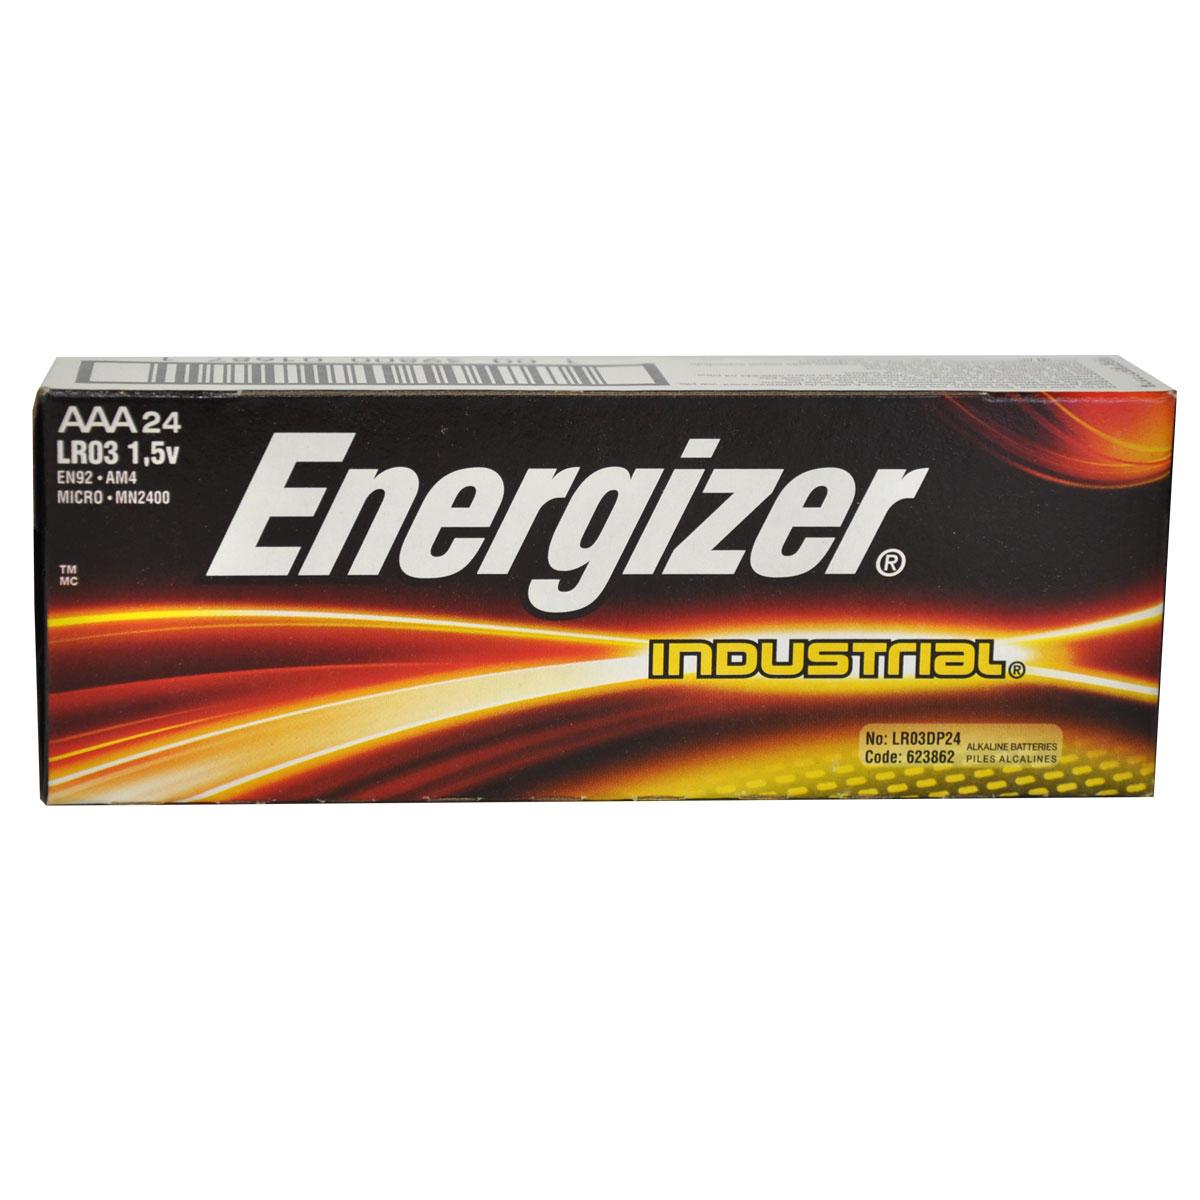 Energizer Industrial AAA Batteries  - 24-Pack